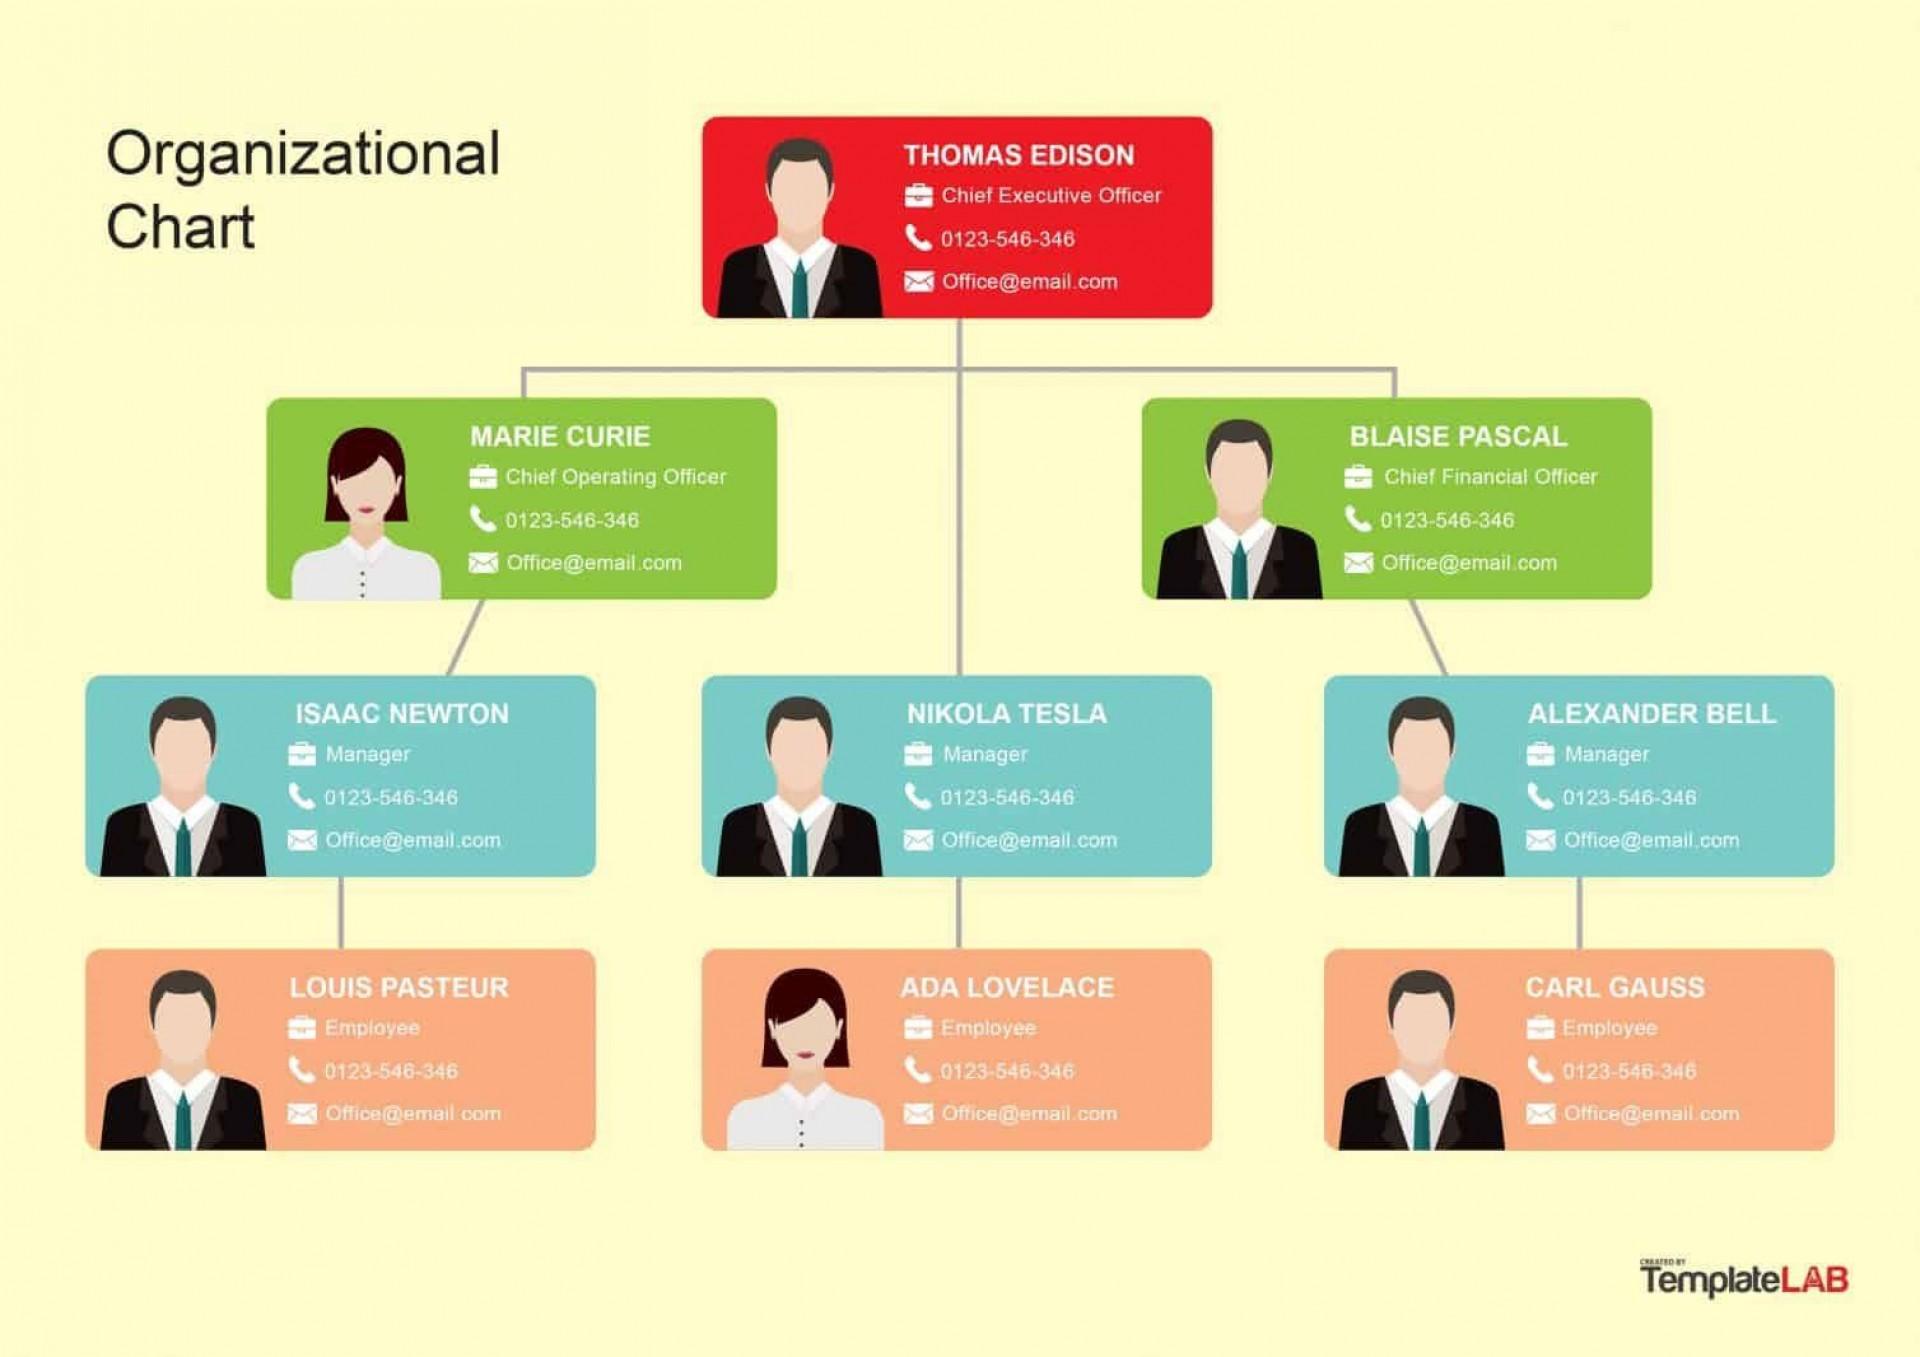 008 Astounding Free Organizational Chart Template Excel 2010 High Resolution 1920